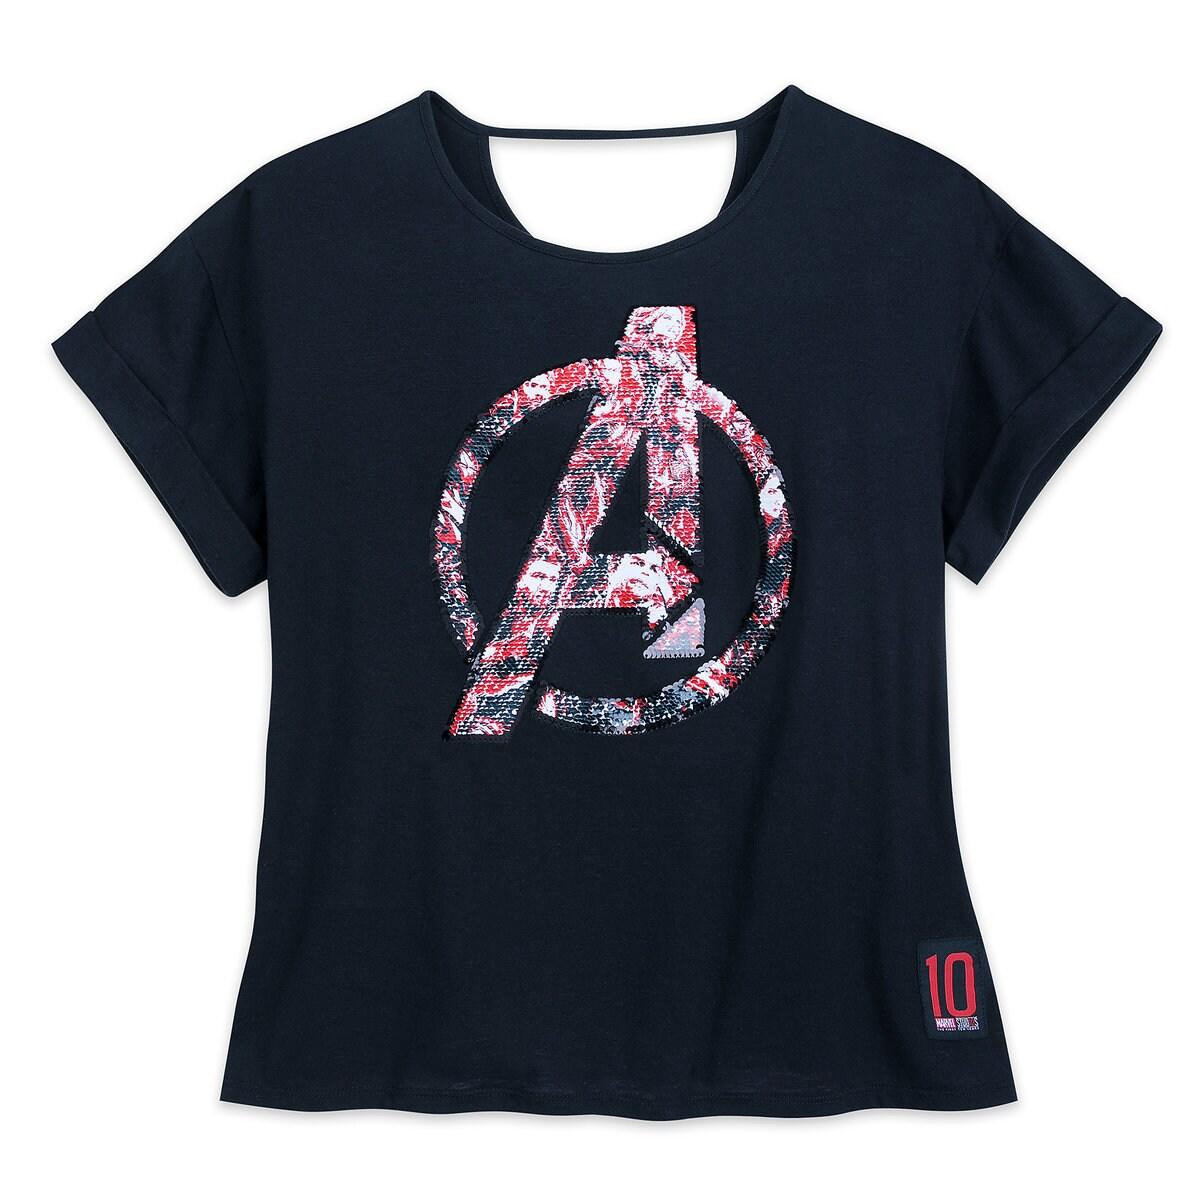 d3a17aa5fcf Product Image of Marvel's Avengers: Endgame Reversible Sequin T-Shirt for  Women # 1